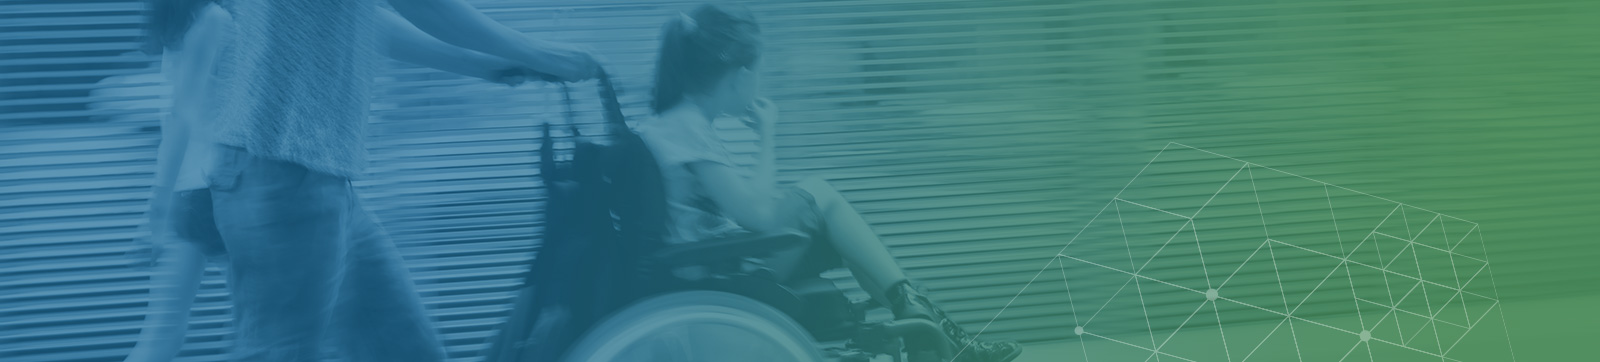 bg-spinal-cord-injury-blog.jpg